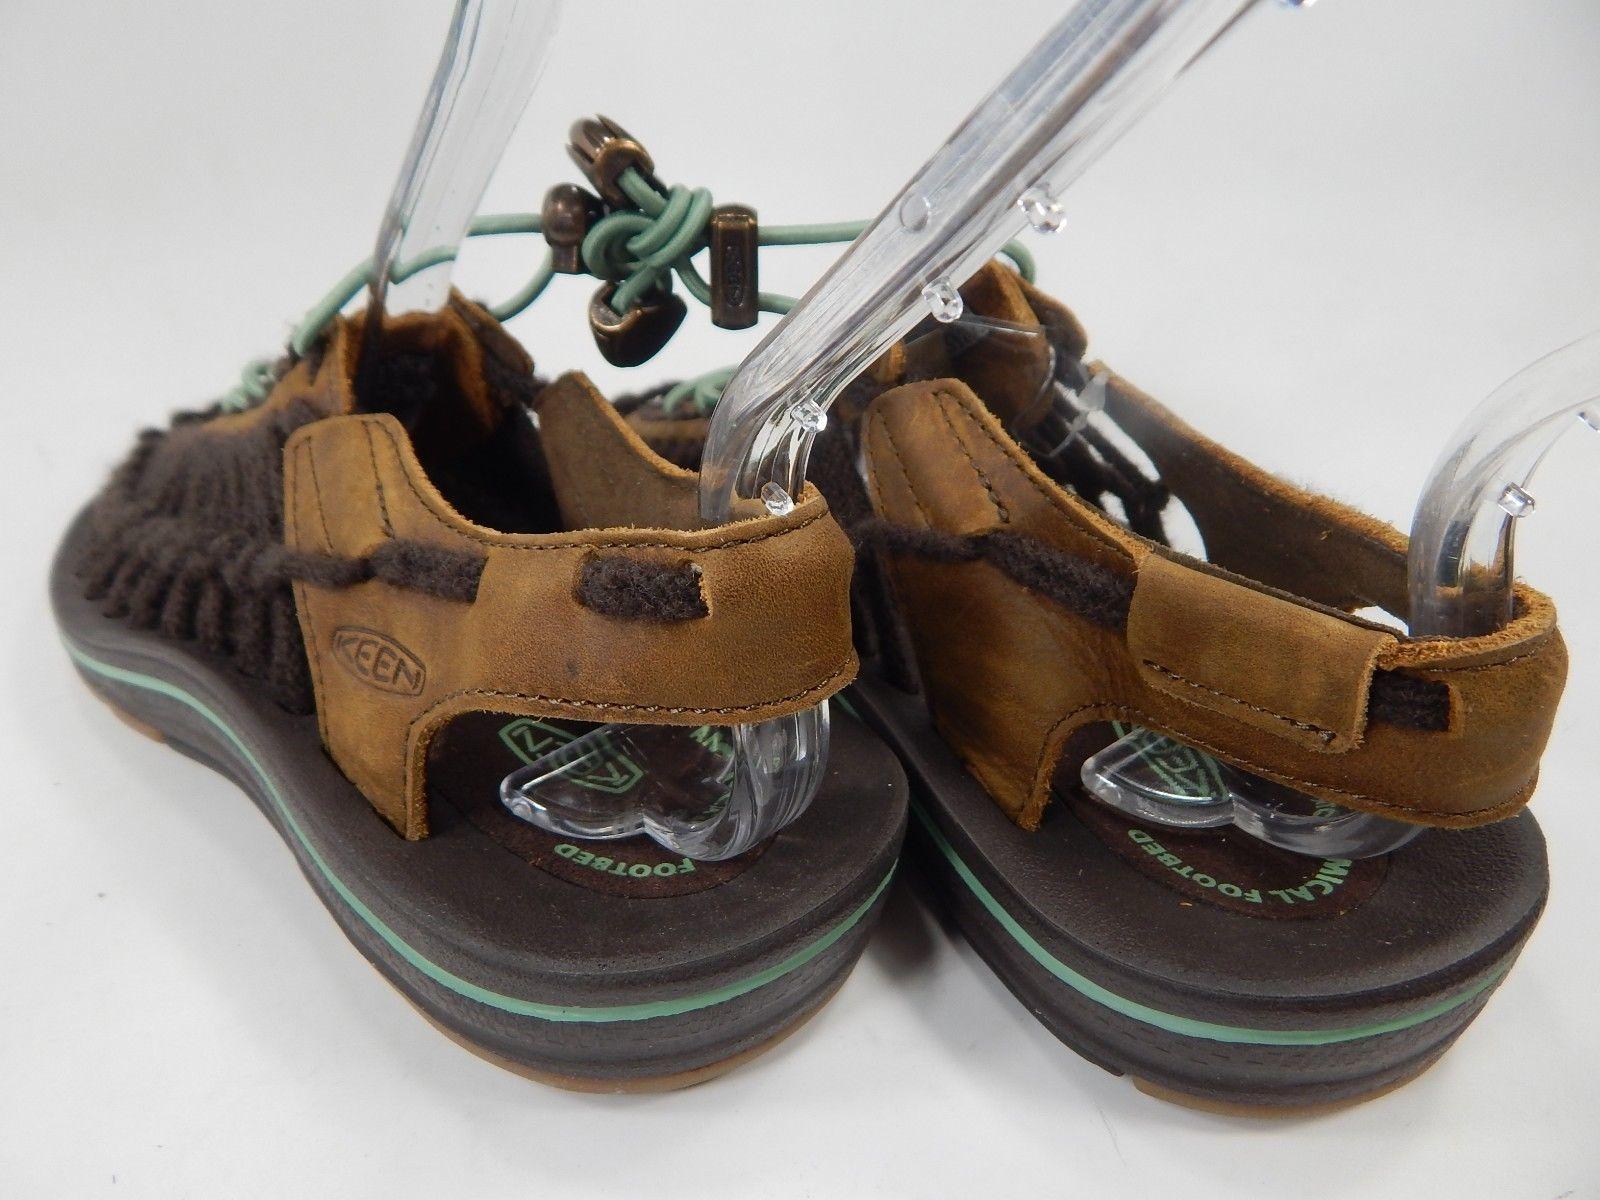 Keen Uneek Leather Women's Sport Sandals Size 7 M (B) EU 37.5 Dark Earth / Basil